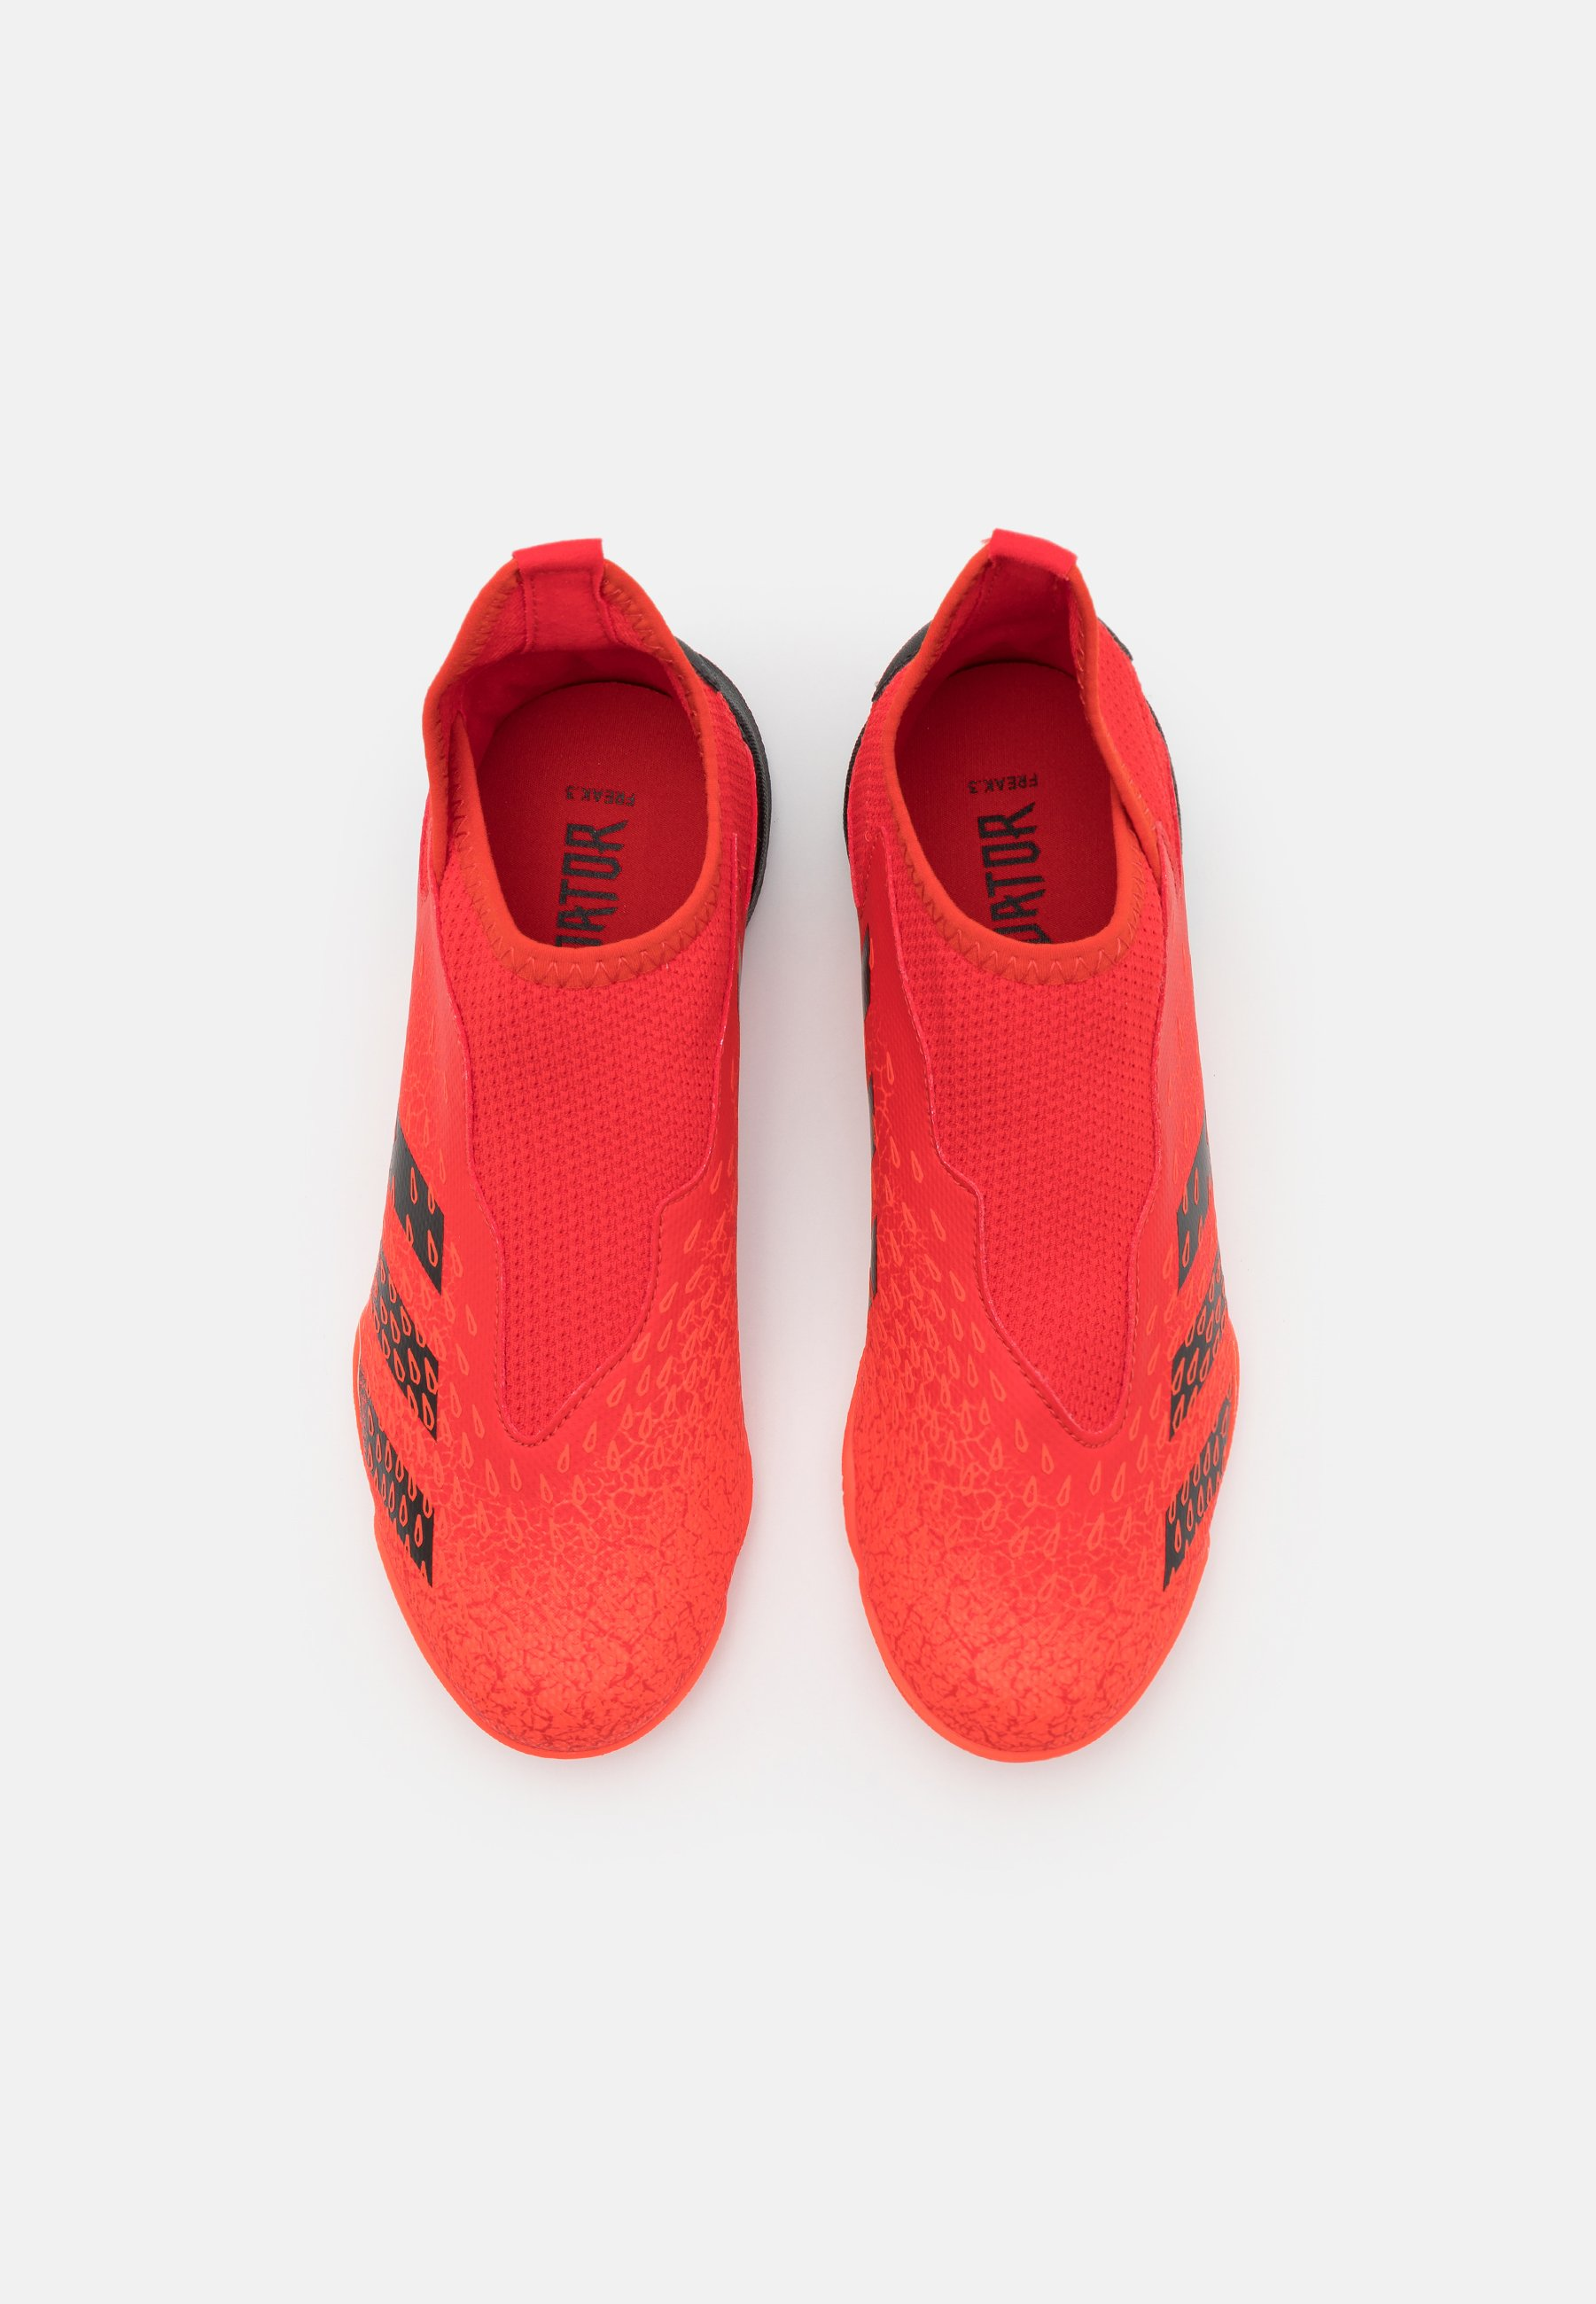 Enfant PREDATOR FREAK 3 UNISEX - Chaussures de foot en salle